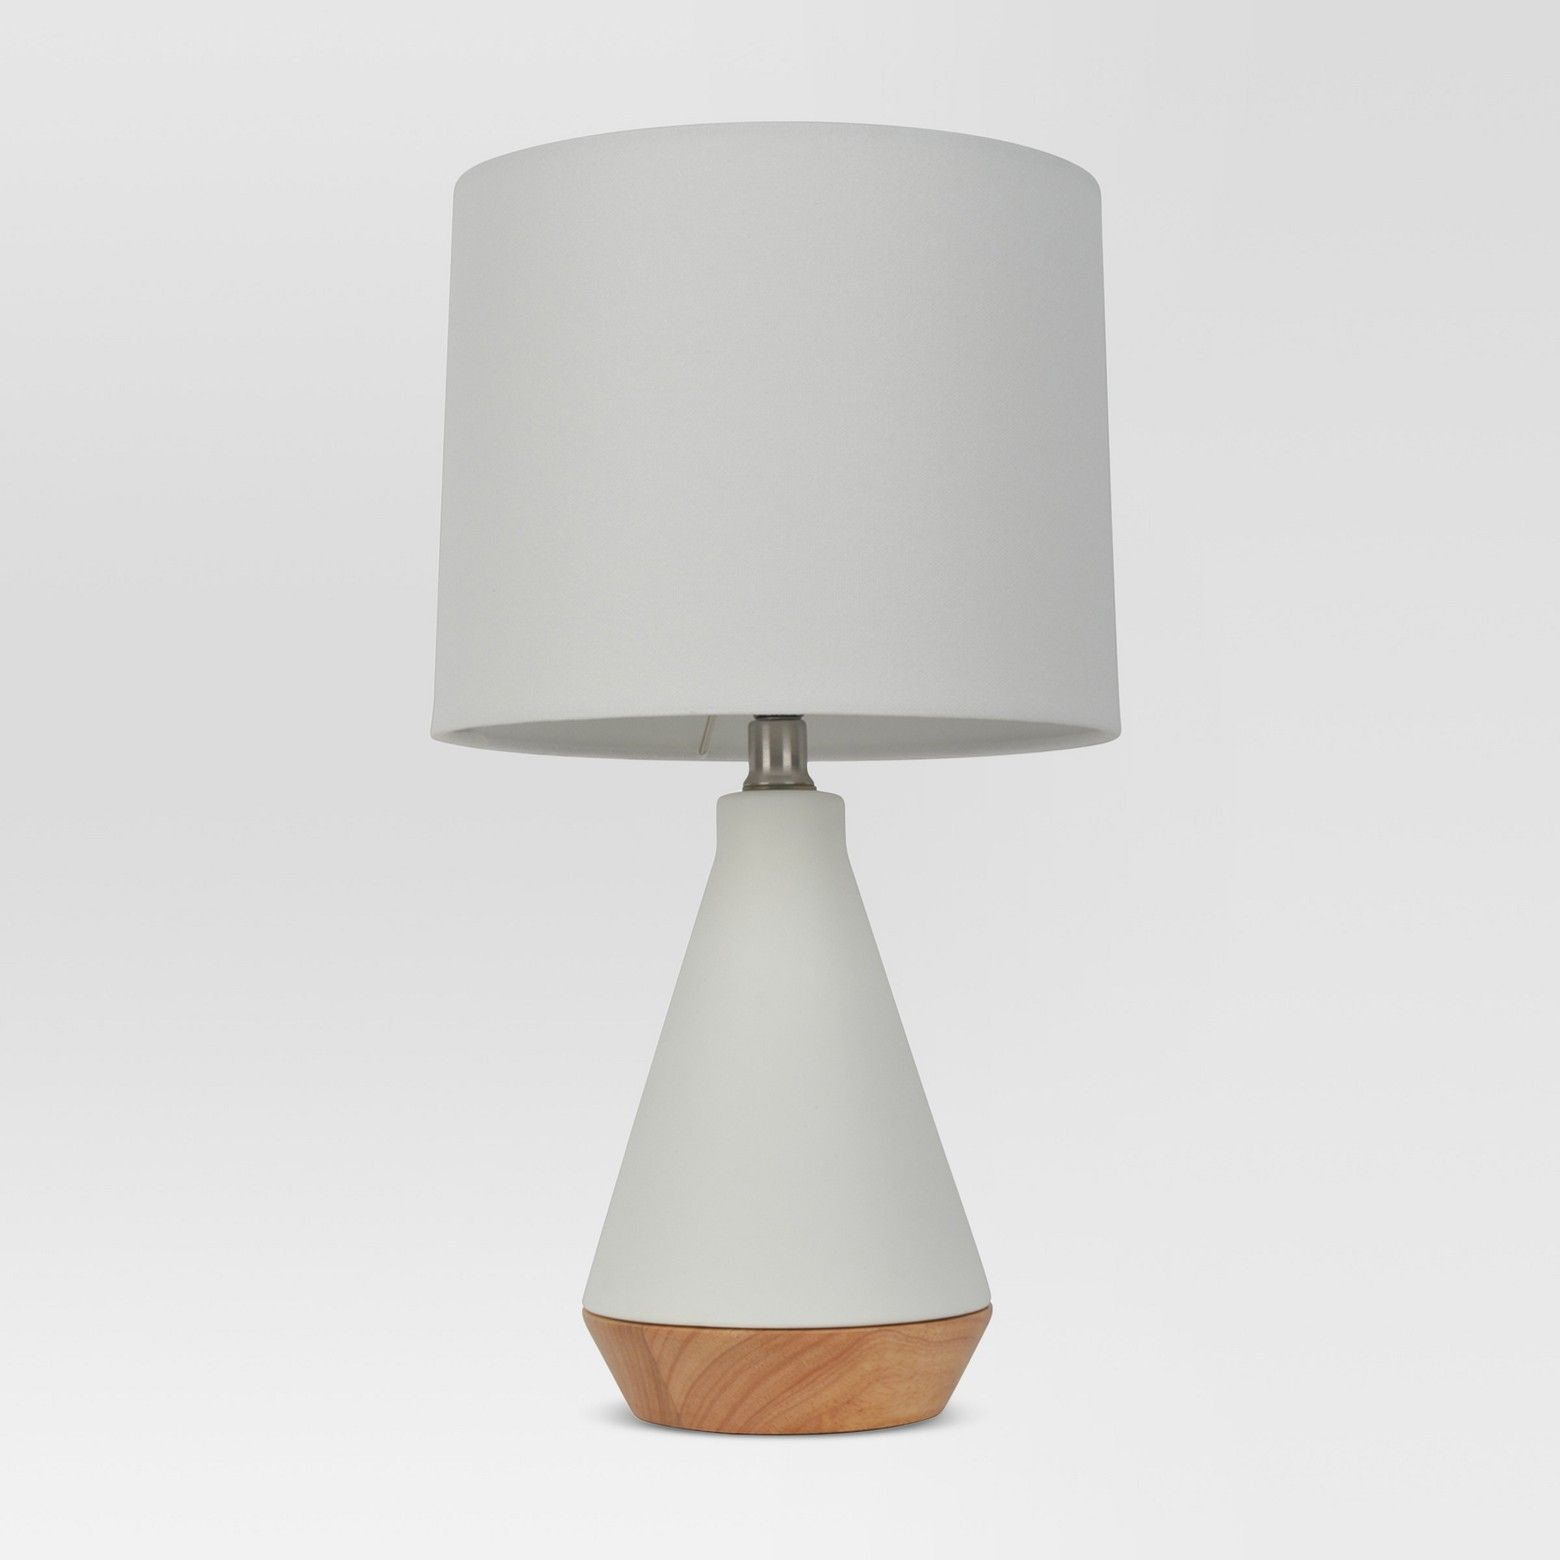 Modern Tapered Ceramic Table Lamp White Project 62 Ceramic Table Lamps Table Lamp White Table Lamp